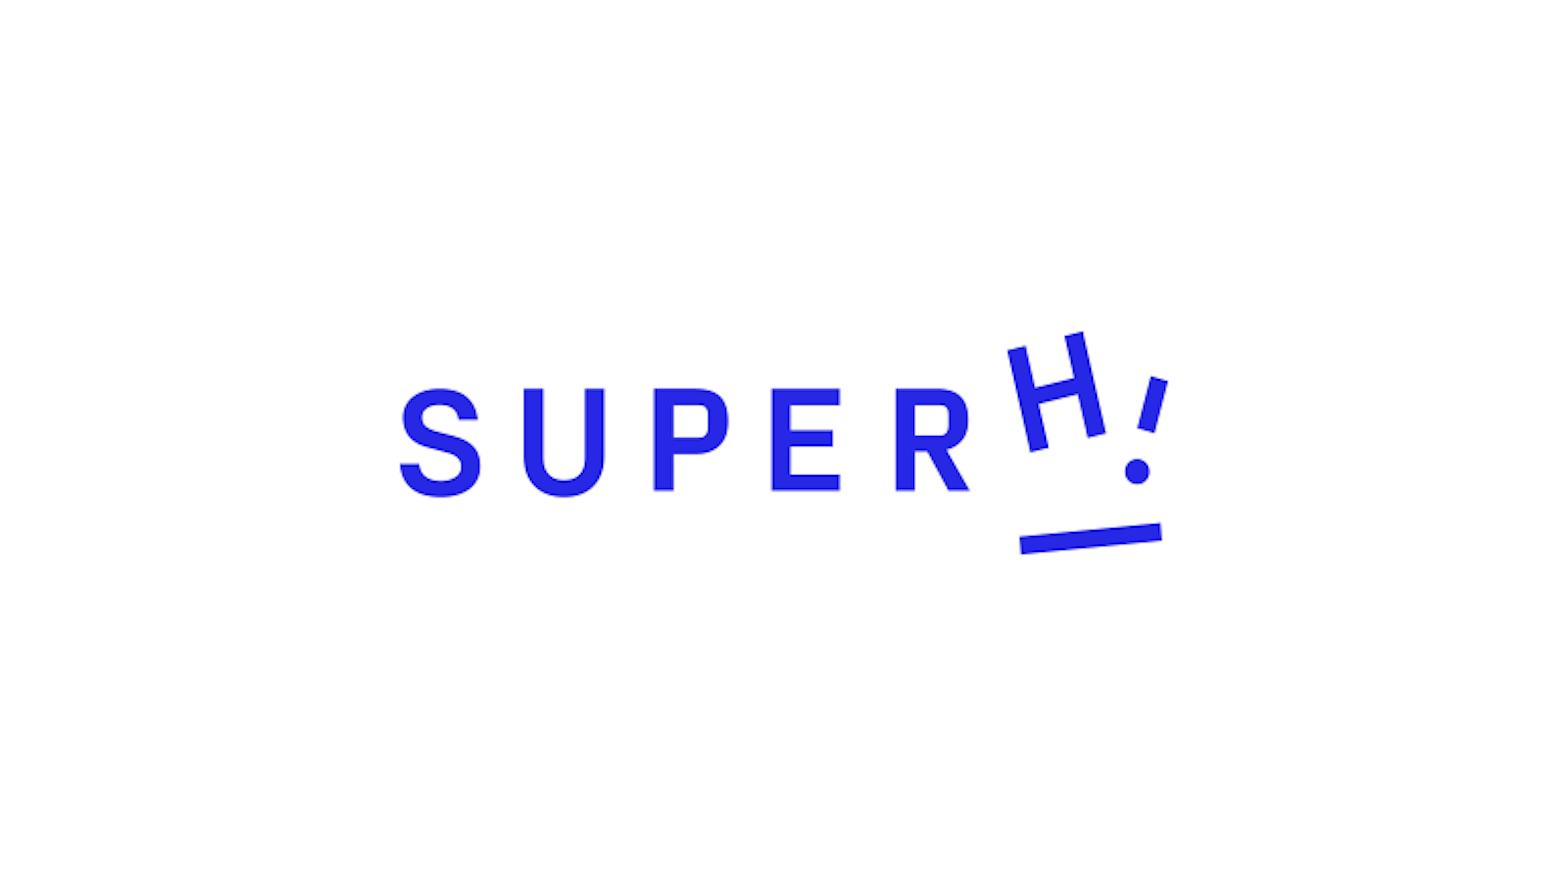 The SuperHi logo